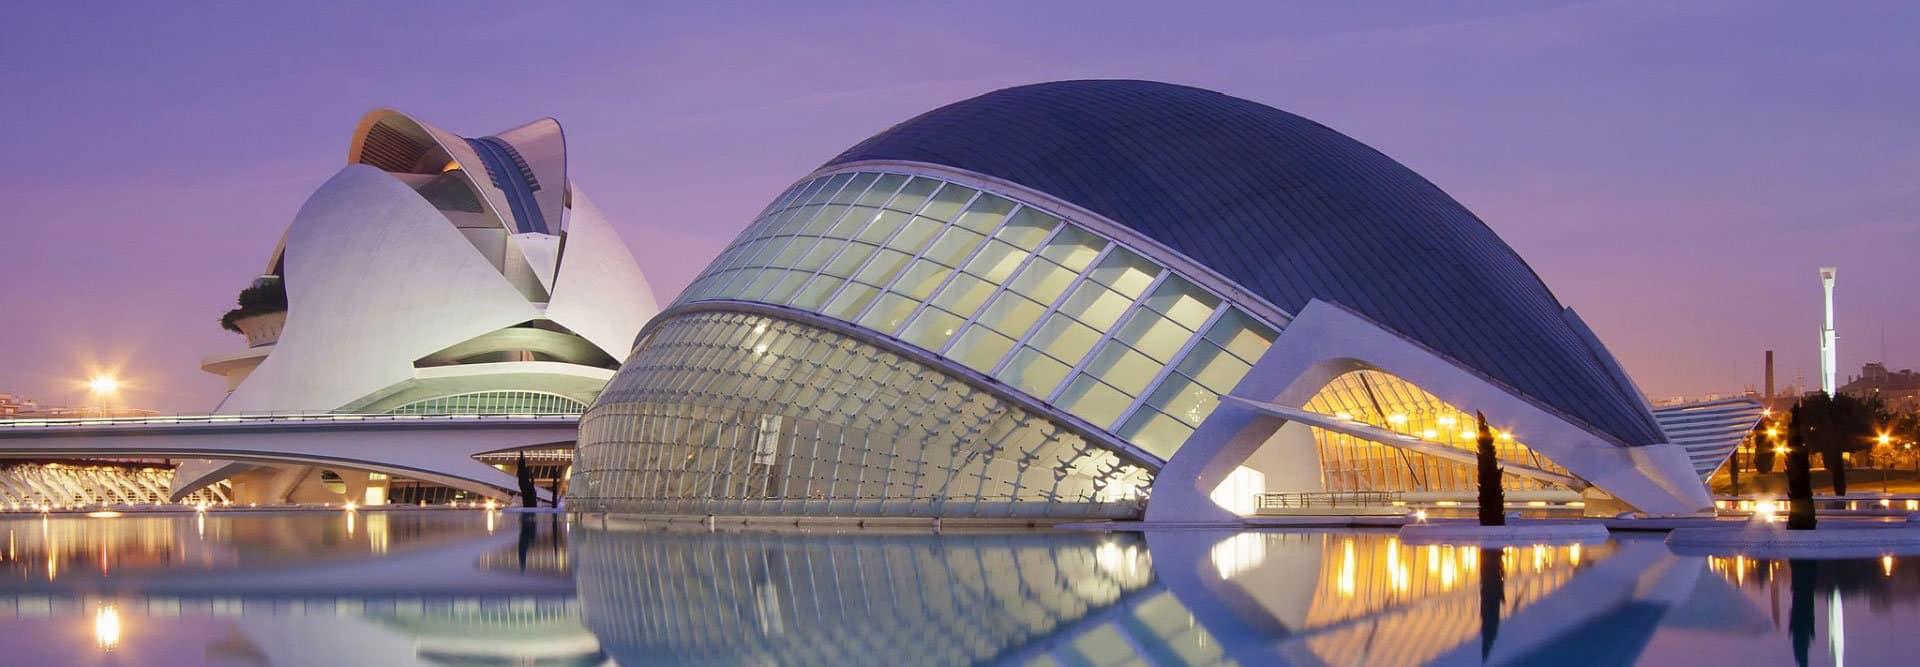 Hemisferic-Valencia-experiences-and-gateways